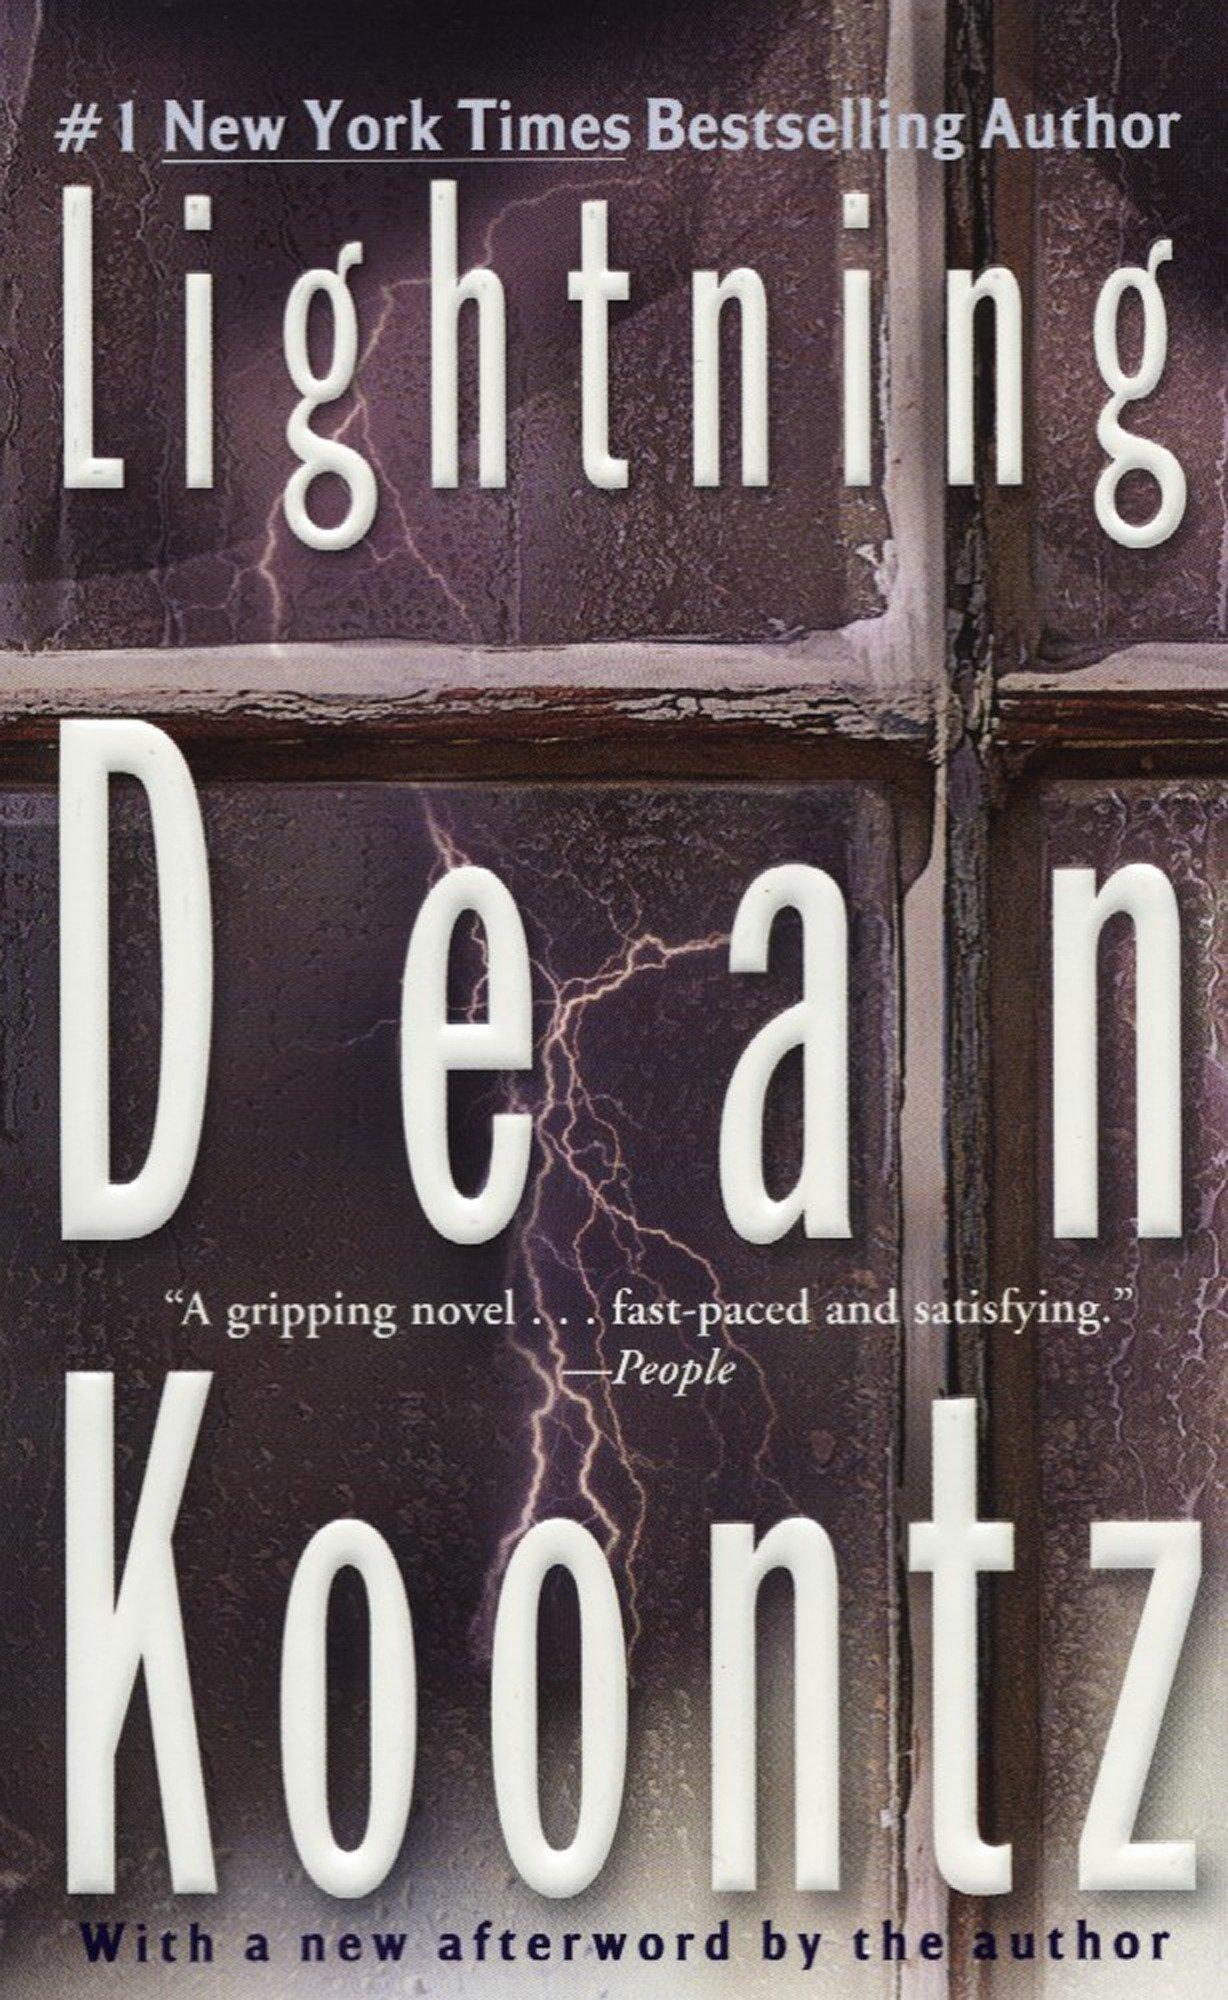 Dean Koontz books 35